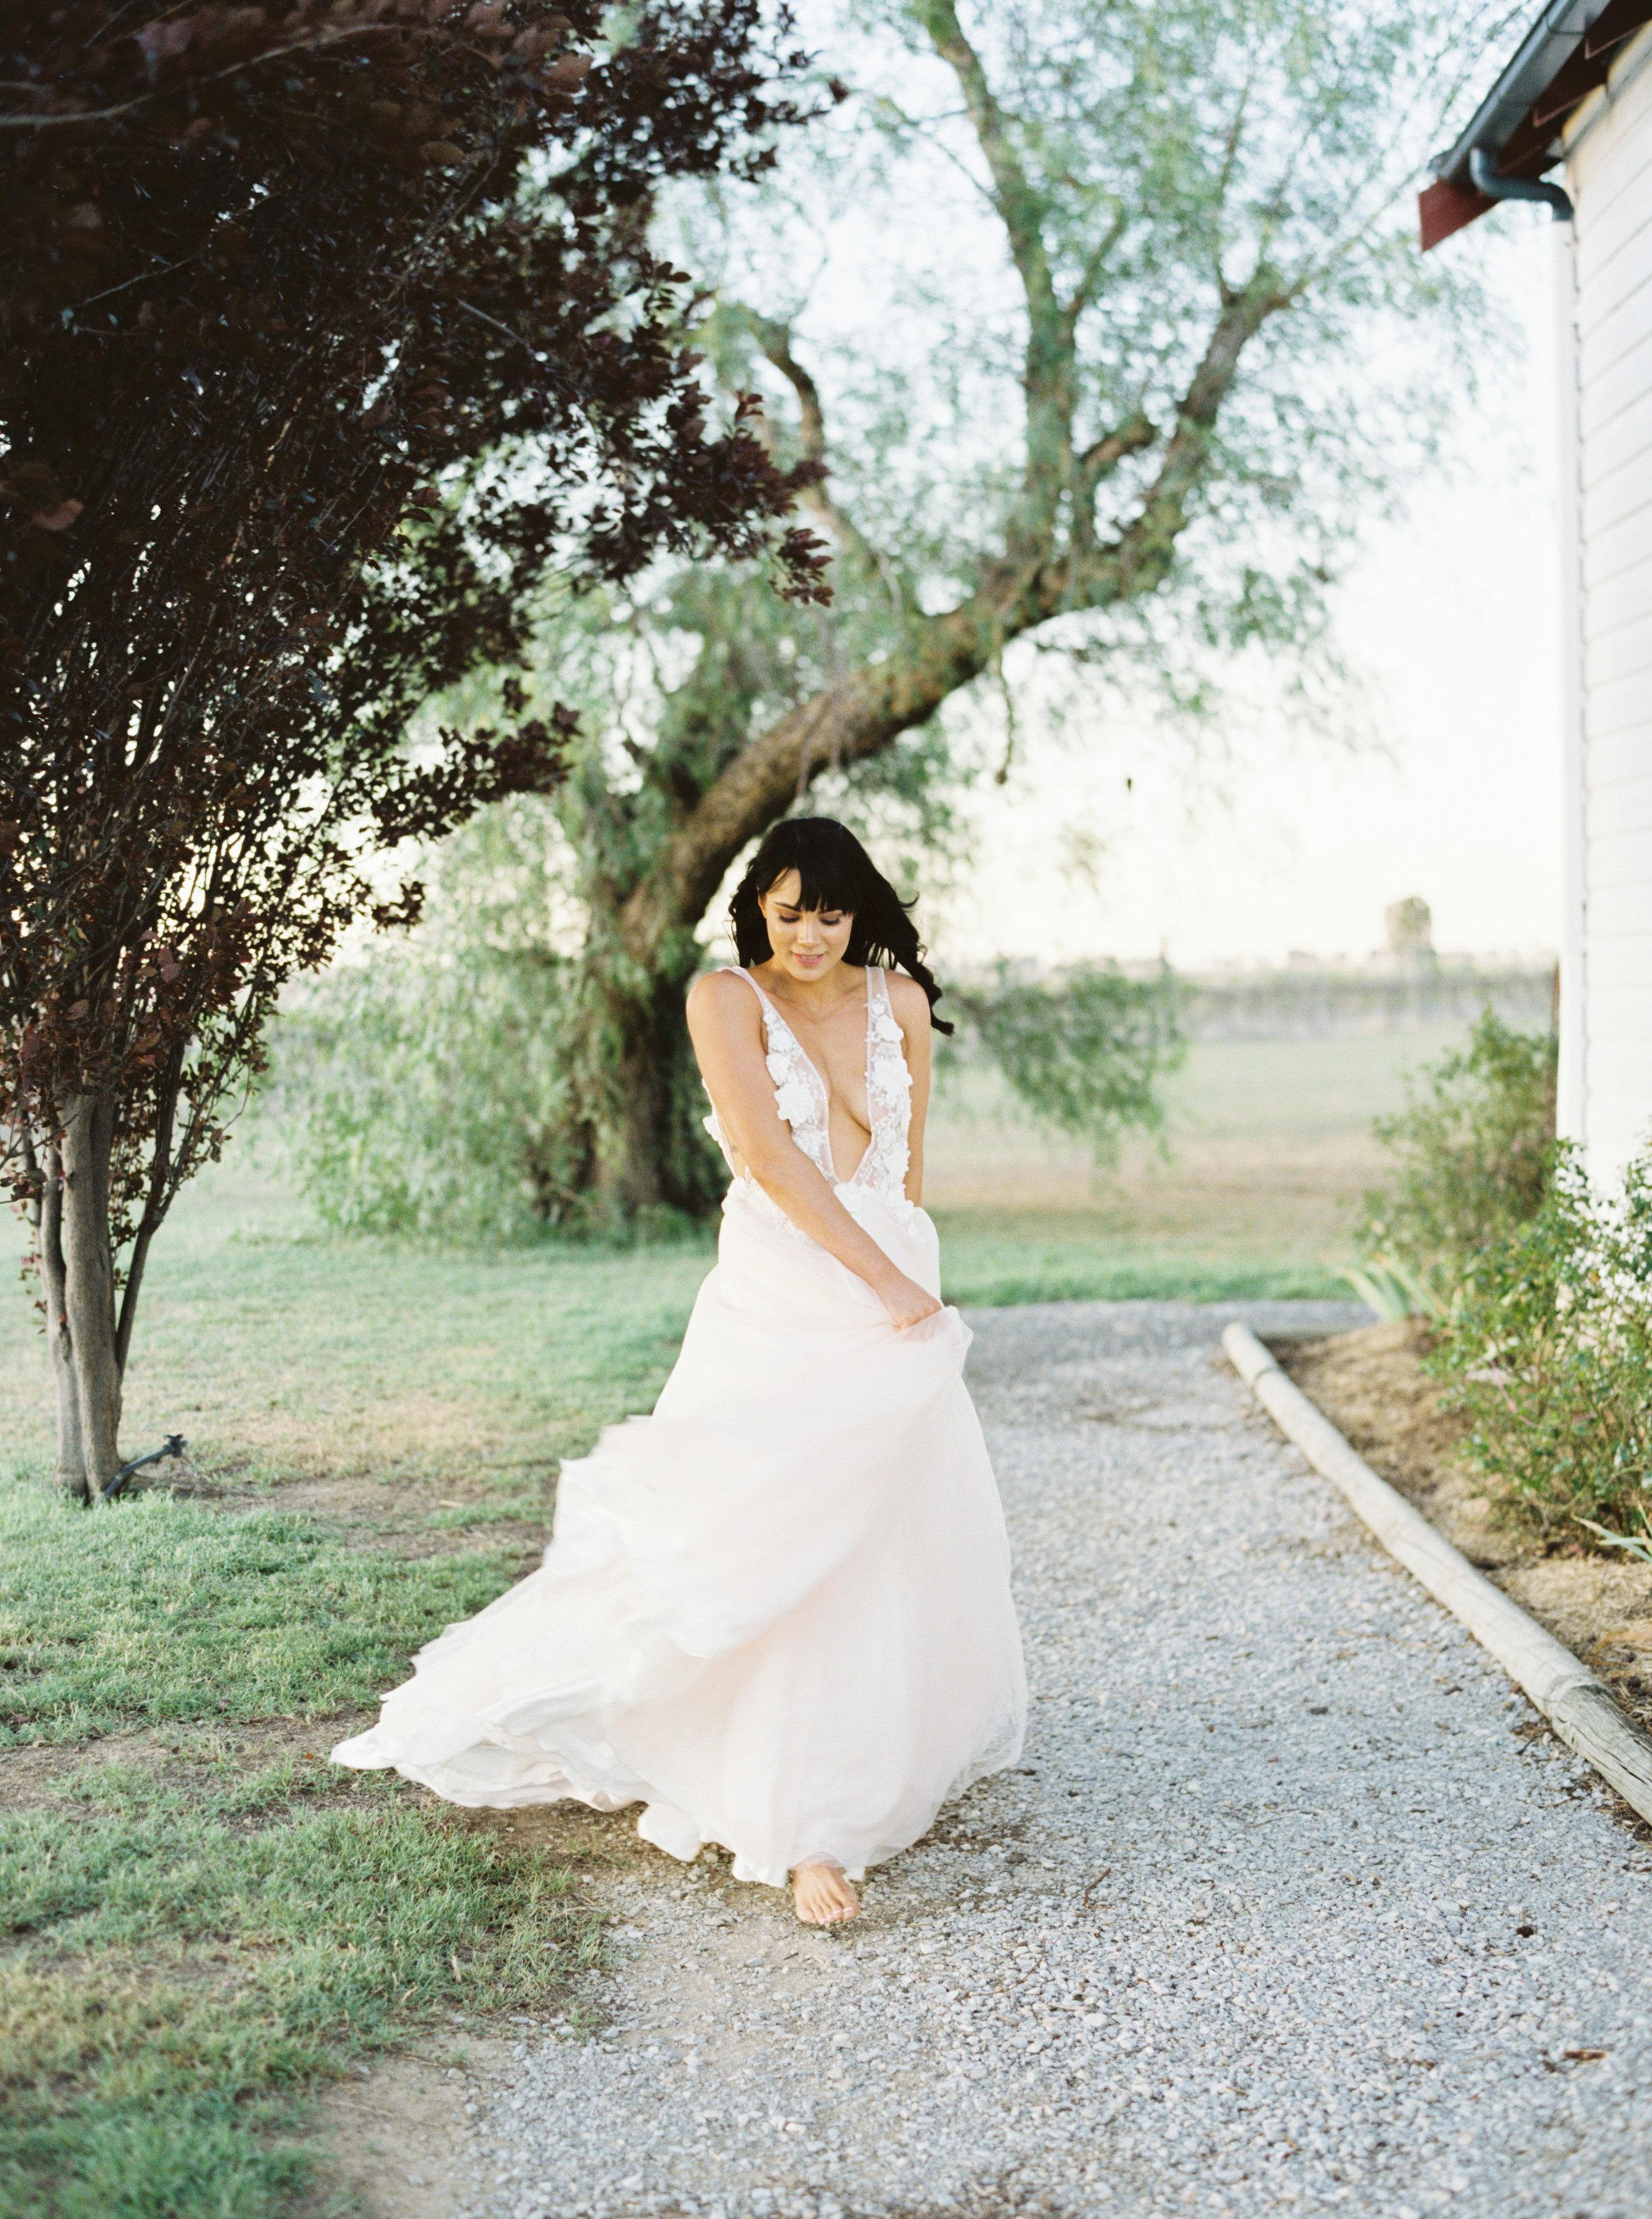 00041- Tamworth NSW Wedding Photographer Sheri McMahon-2.jpg